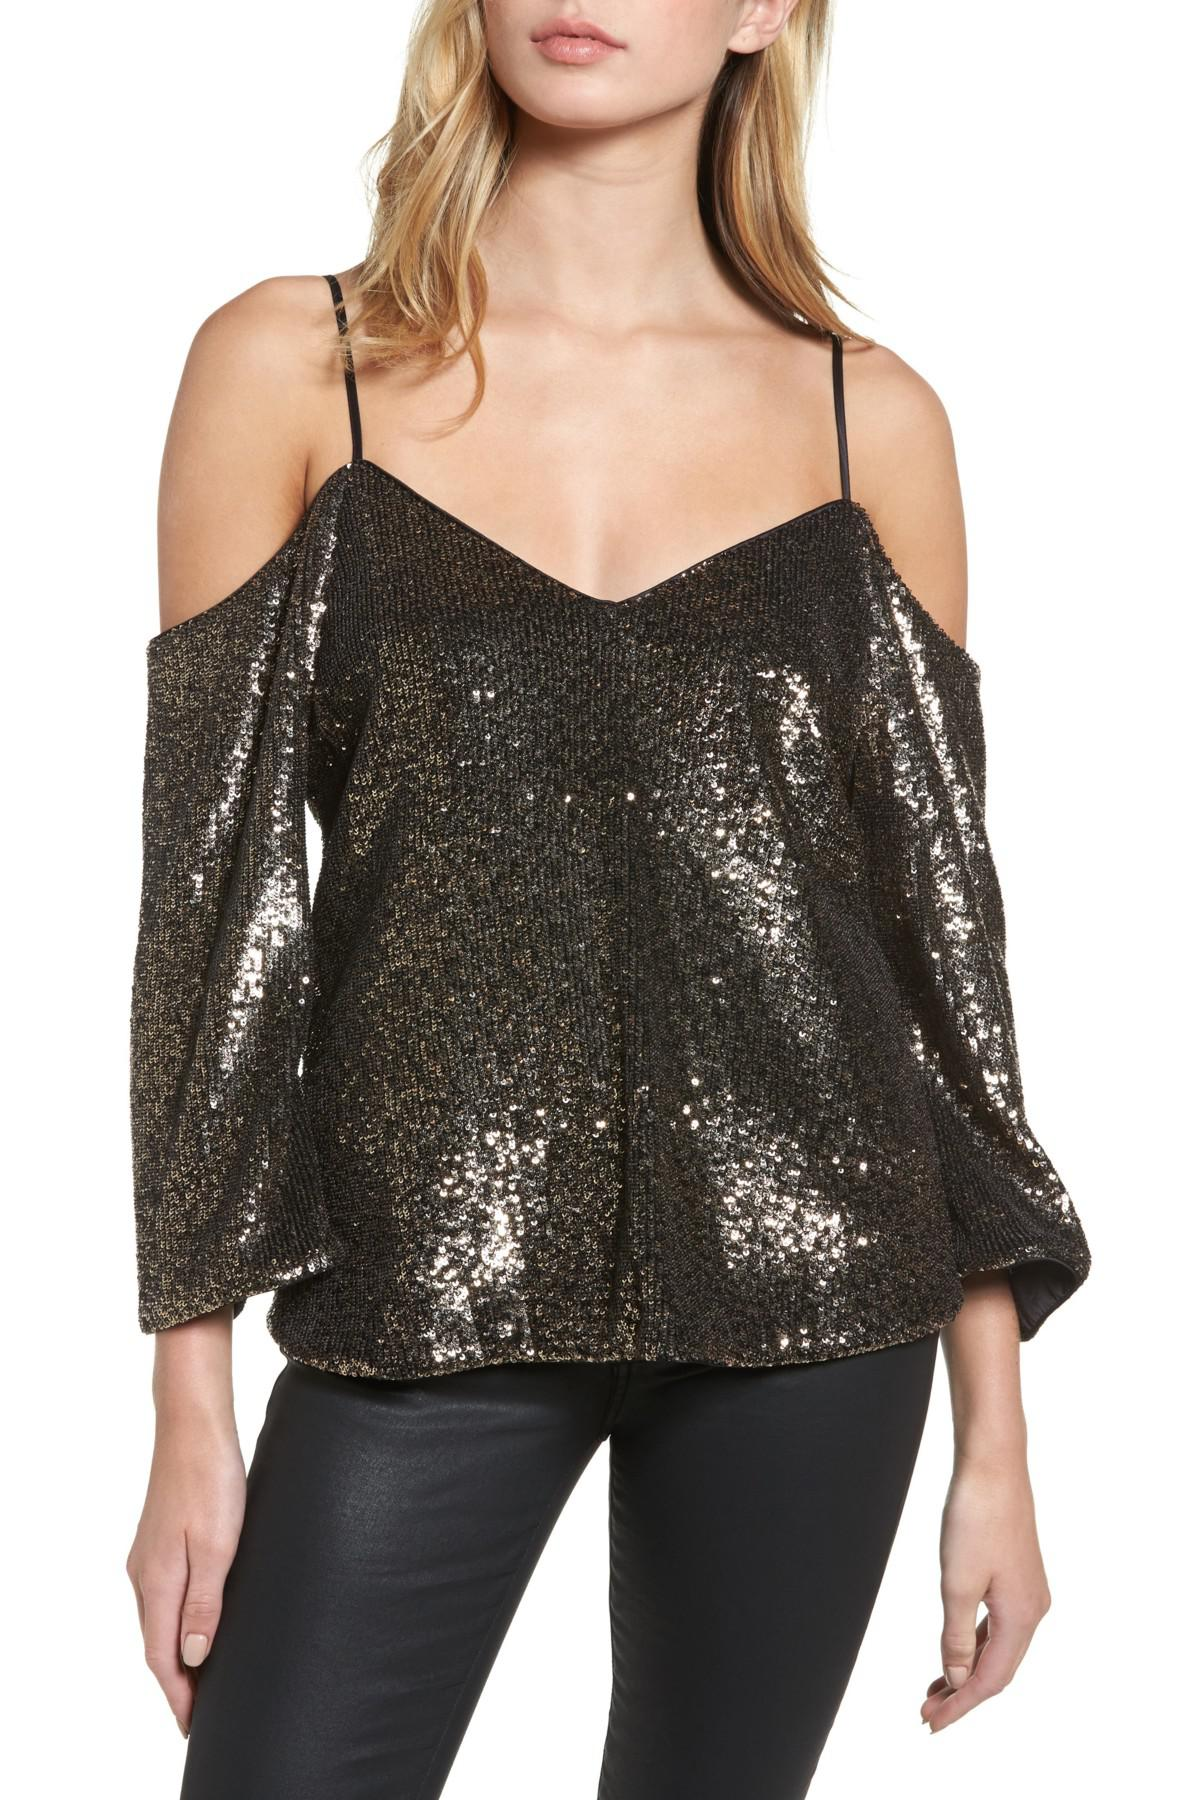 c20a3e26ded4d3 Lyst - Bardot Sequin Cold Shoulder Top in Metallic